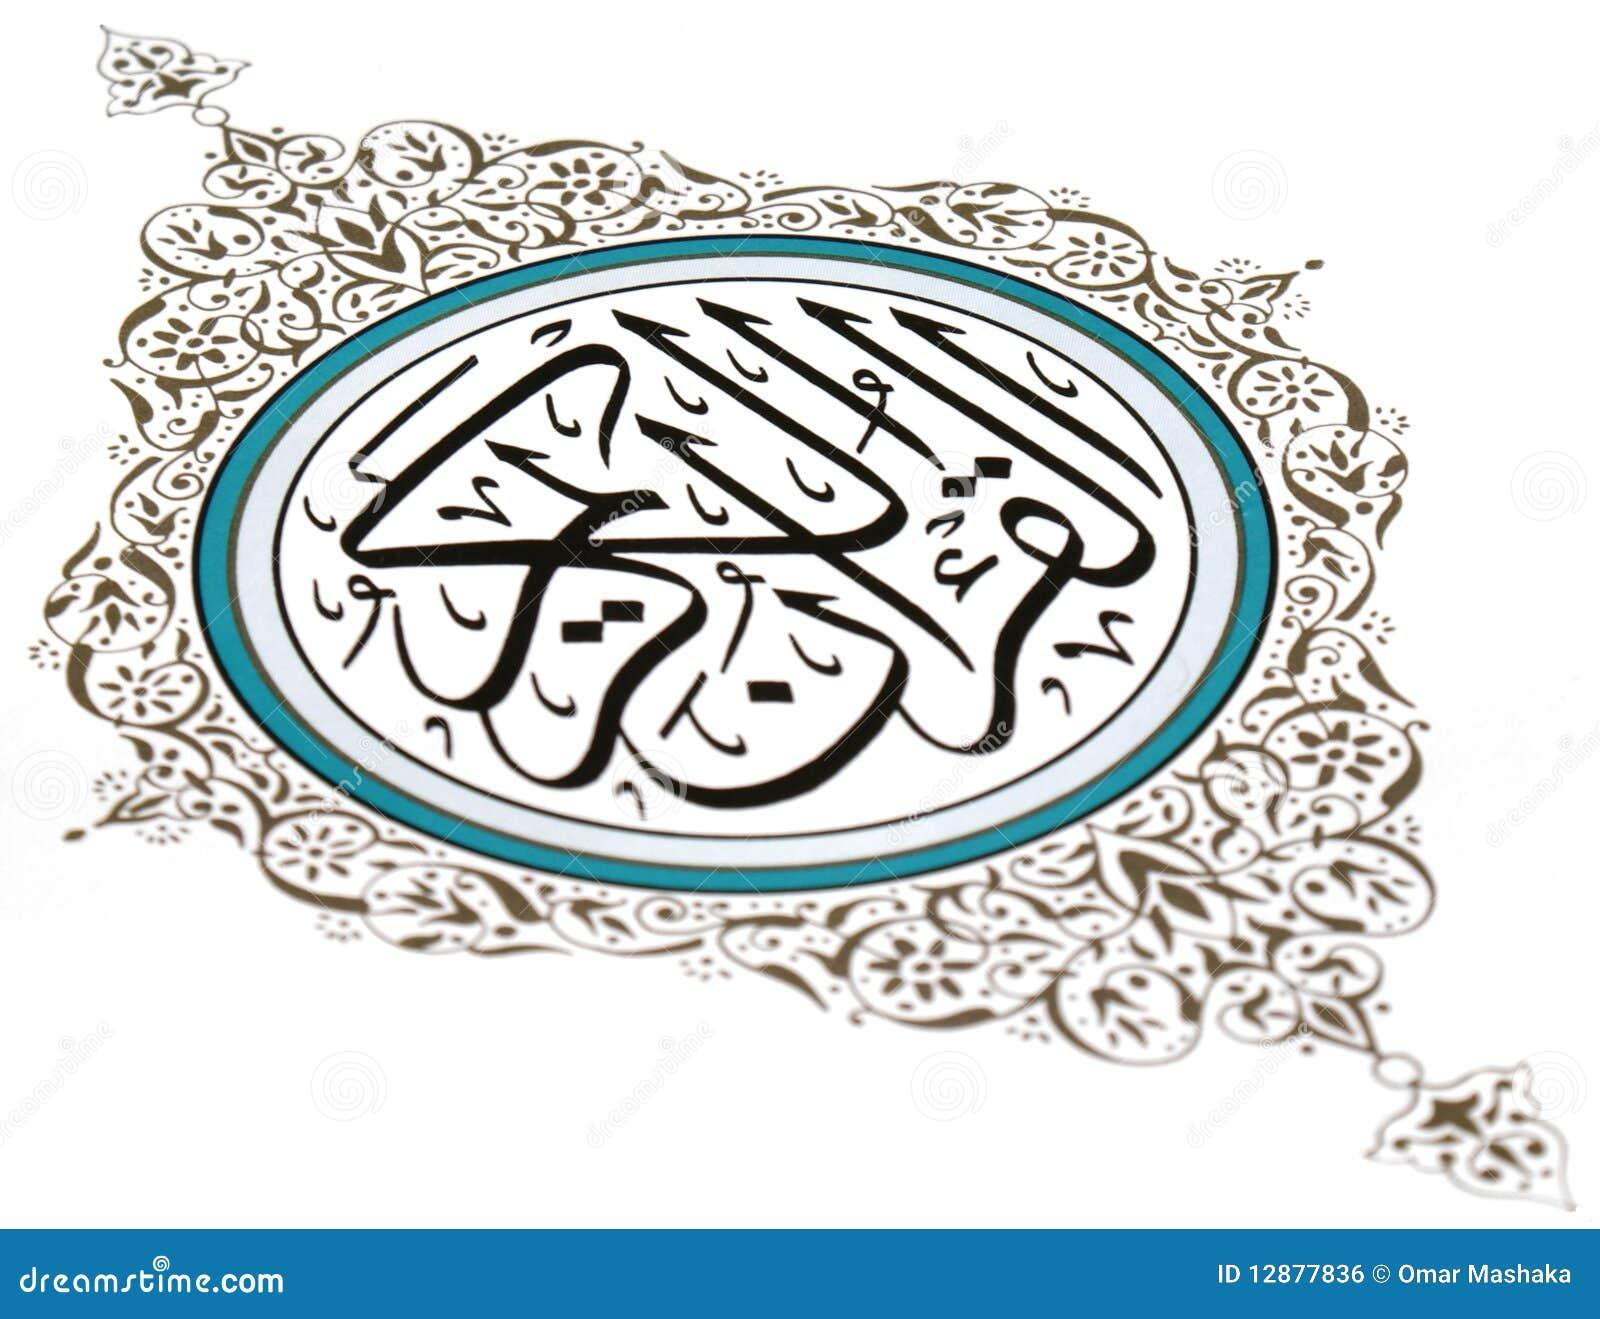 Arabic Book Cover Design Vector : Arabic holy quran design royalty free stock image